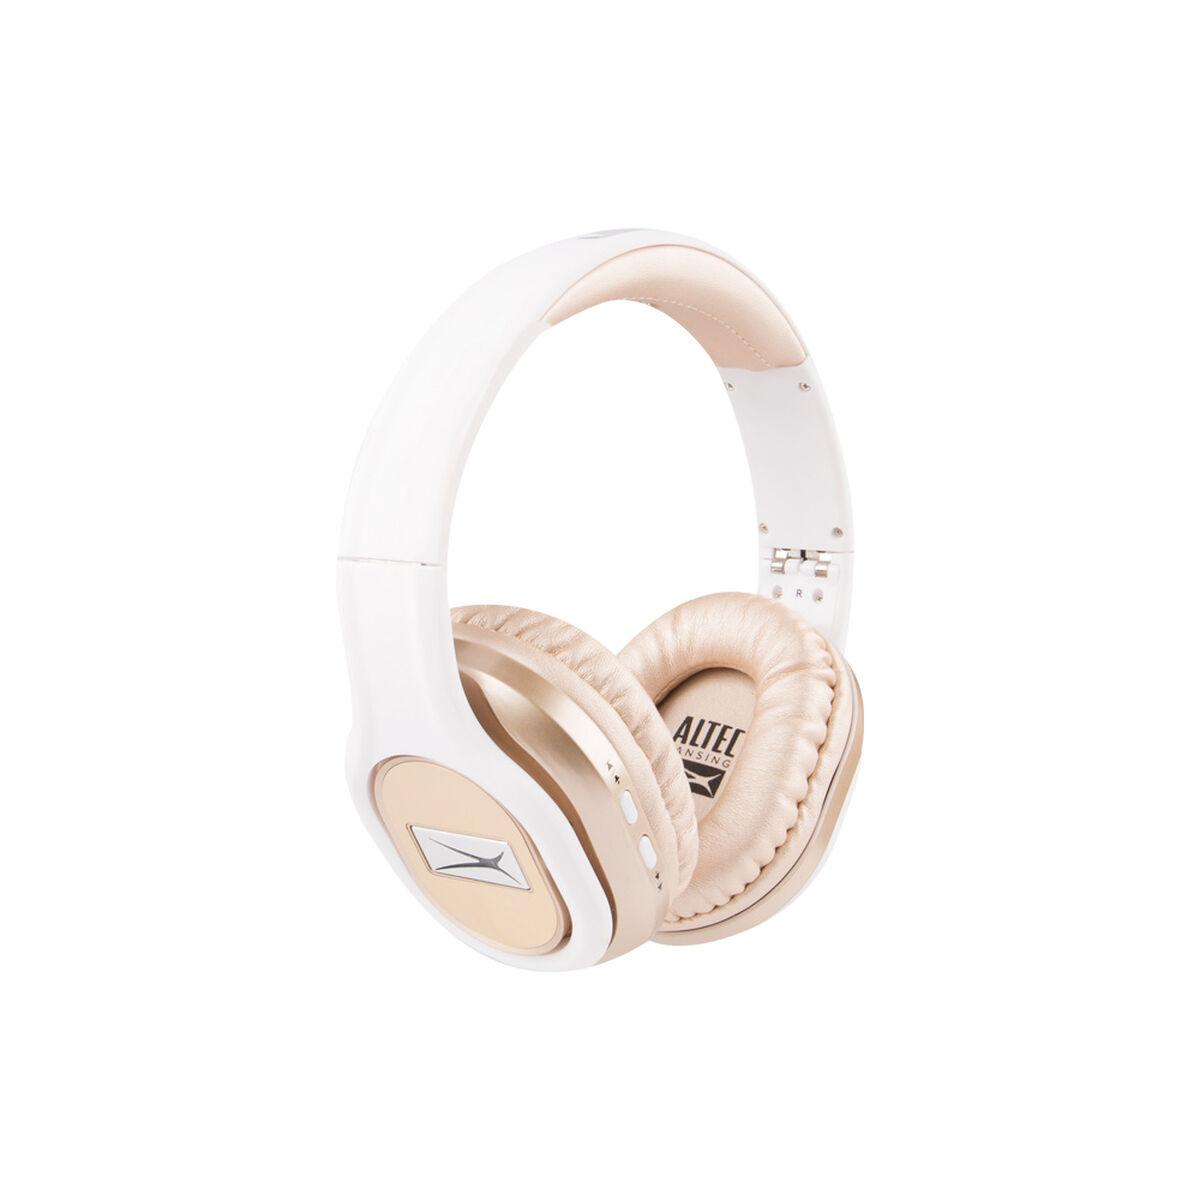 Audífonos Bluetooth Altec Lansing MZX667 Dorados